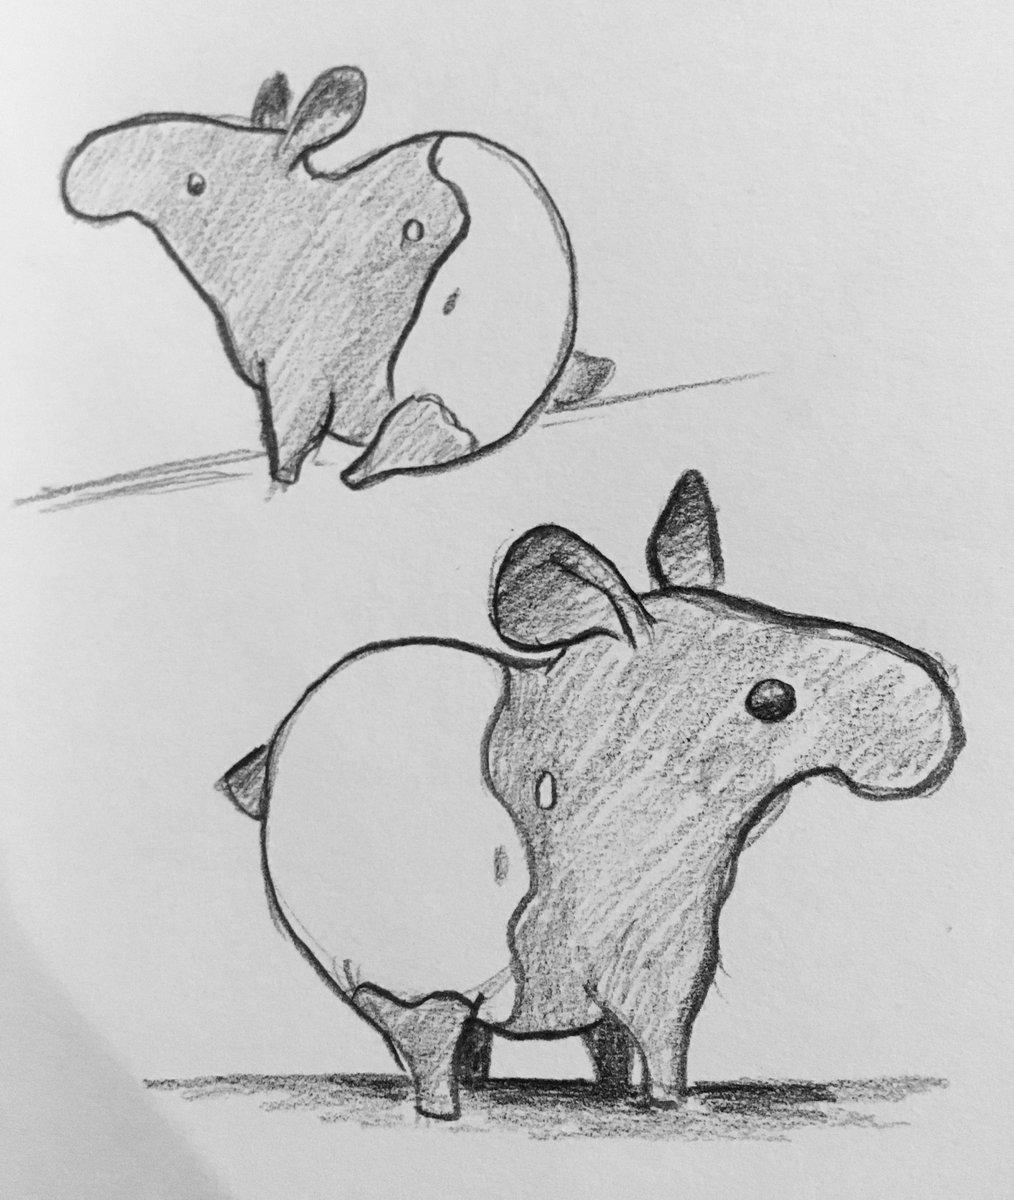 Baby Tapirs On Twitter Rt Kowaikawaii Inktober2016 Day 5 Baby Tapir Mini From Ffxiv Https T Co Bxhdtqzl5e